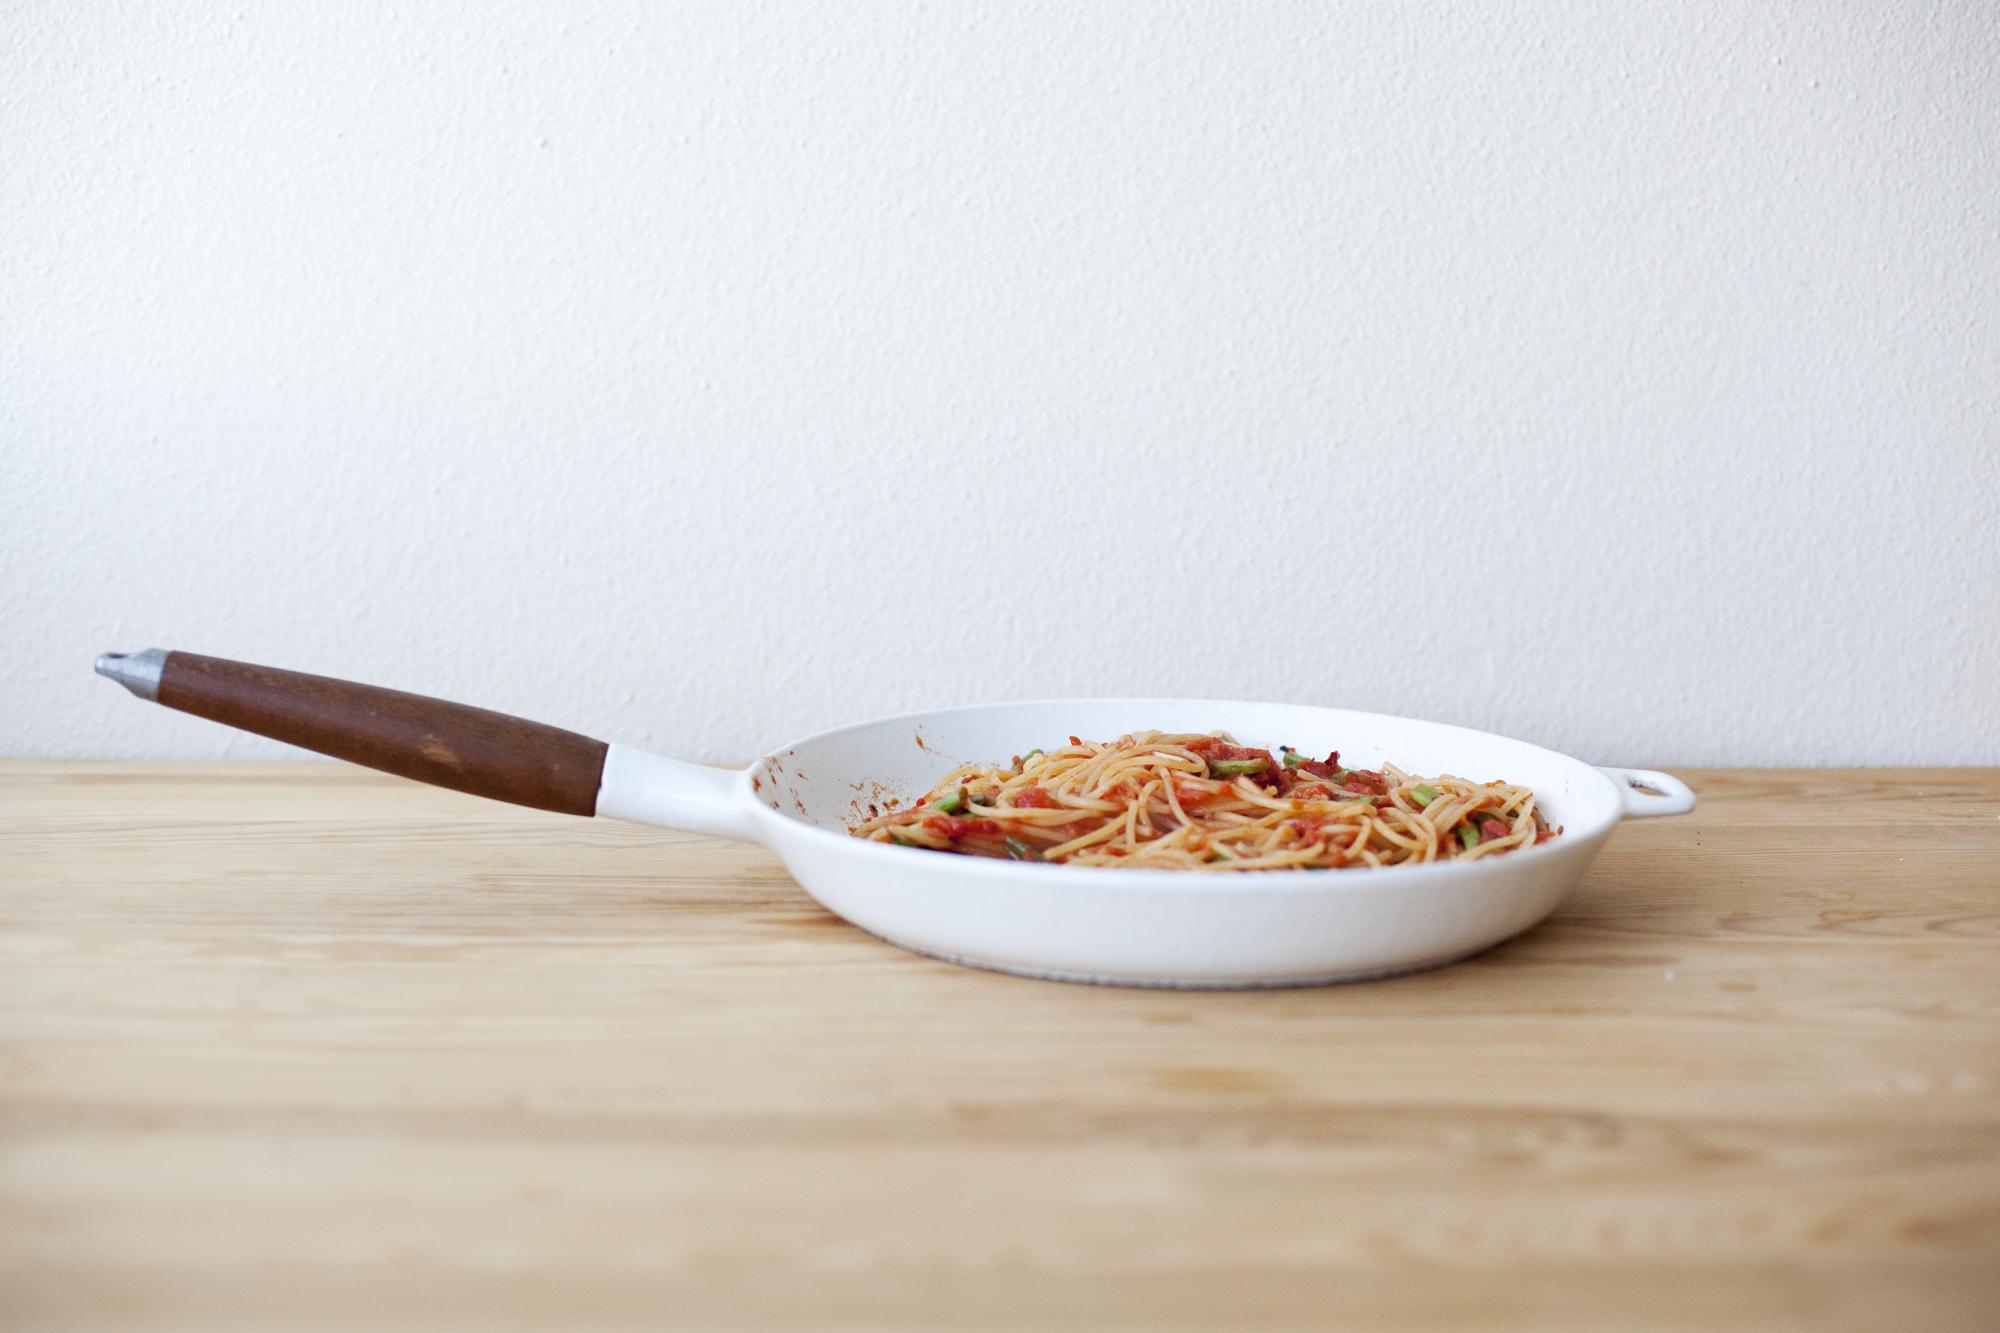 naked tomato sauce spaghetti recipe via smitten kitchen | //eat